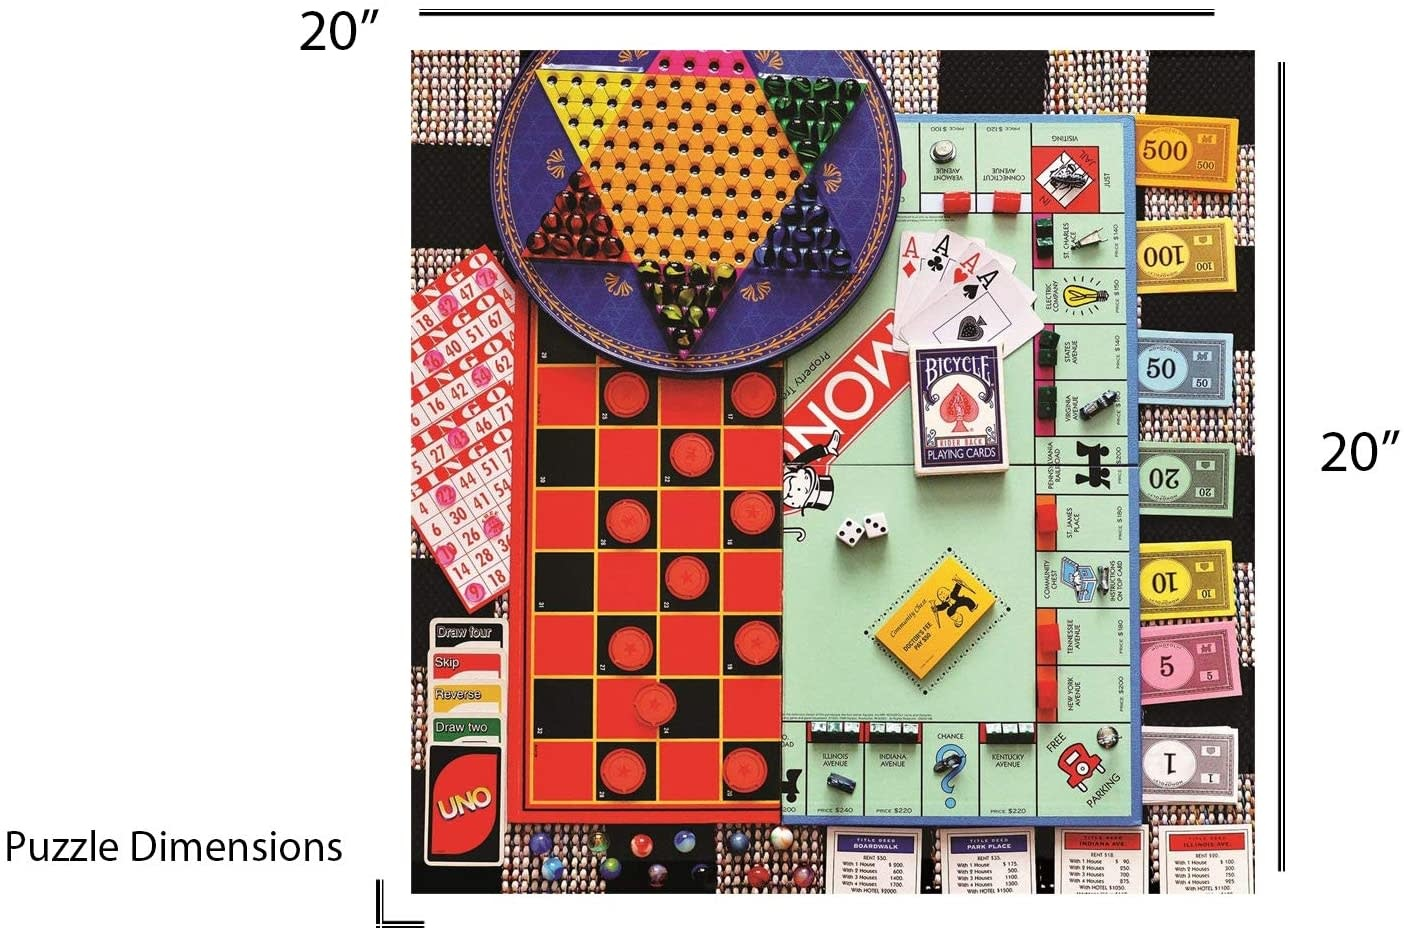 Board Games 500-pc Puzzle by Springbok